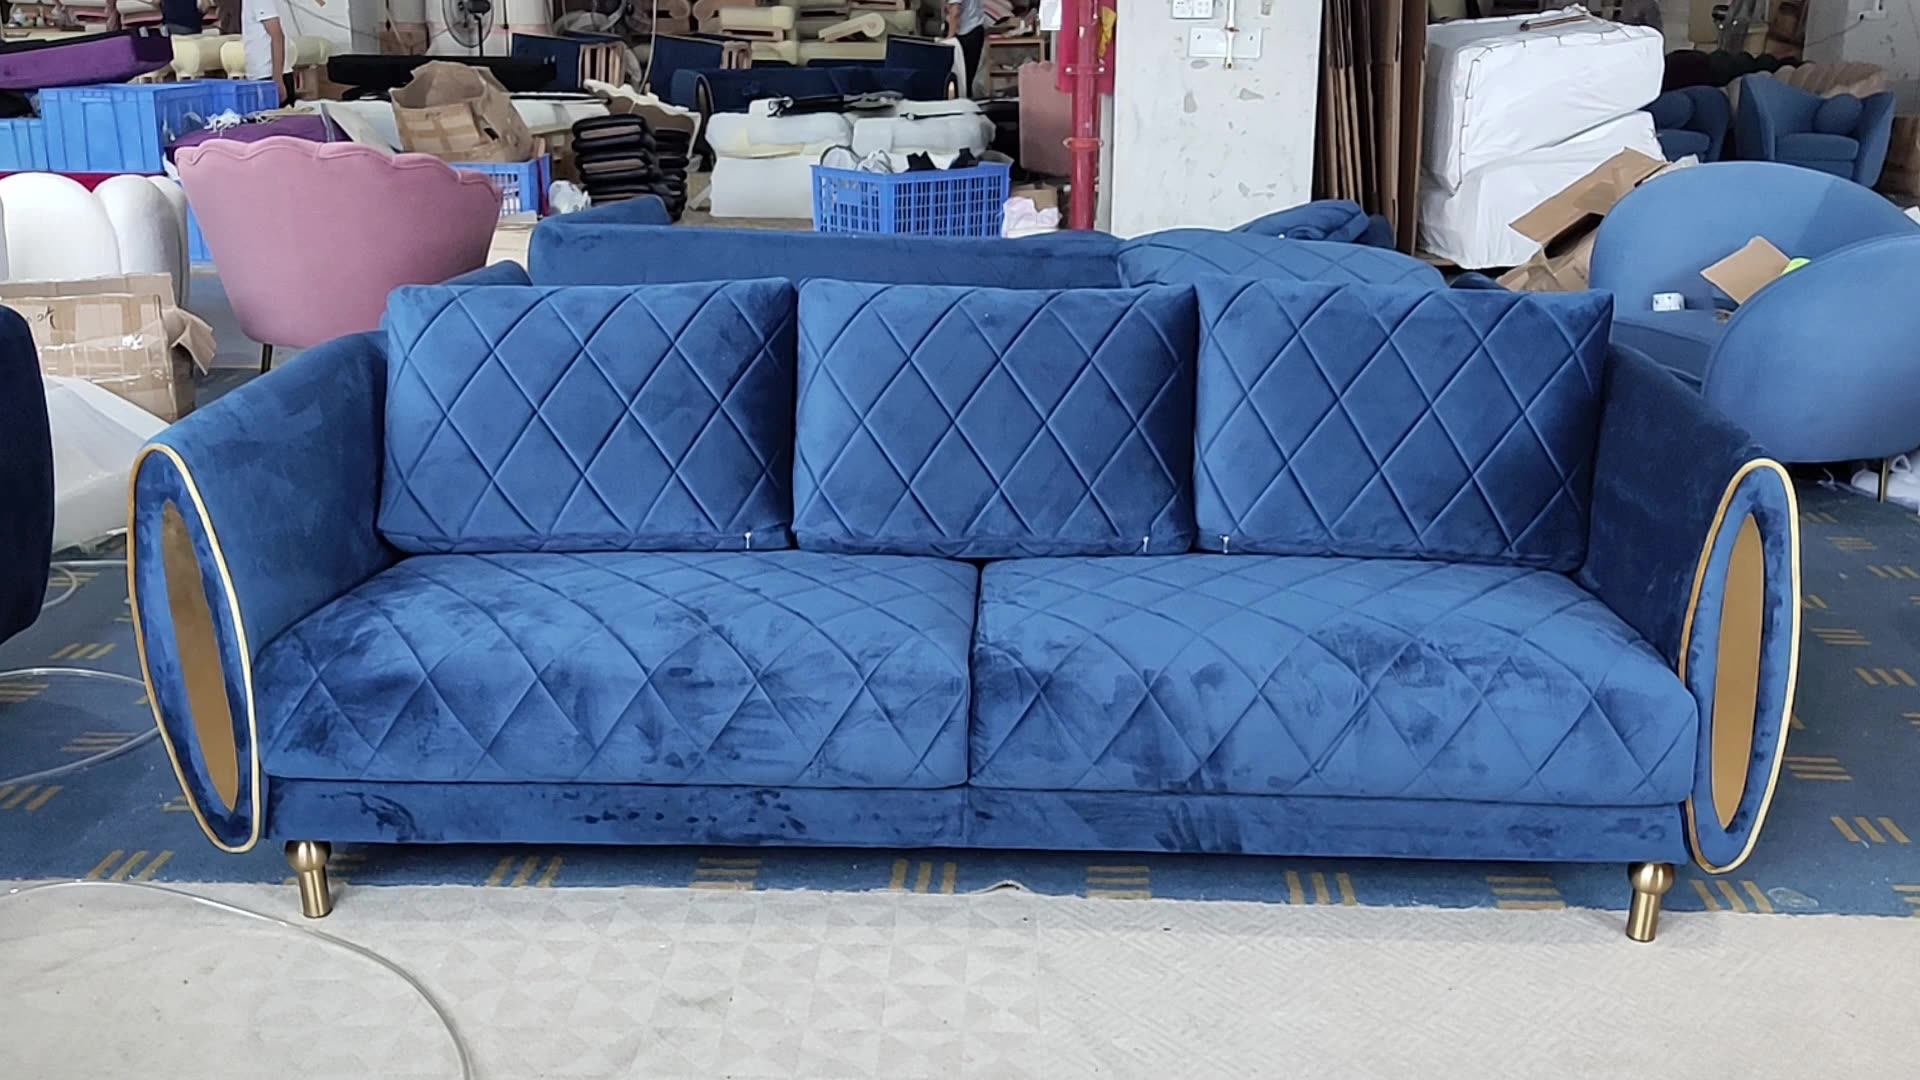 De Lujo tela acolchada Argyle sofá salón hogar muebles 3-seater de terciopelo cojín del sofá de Metal espejo Armside